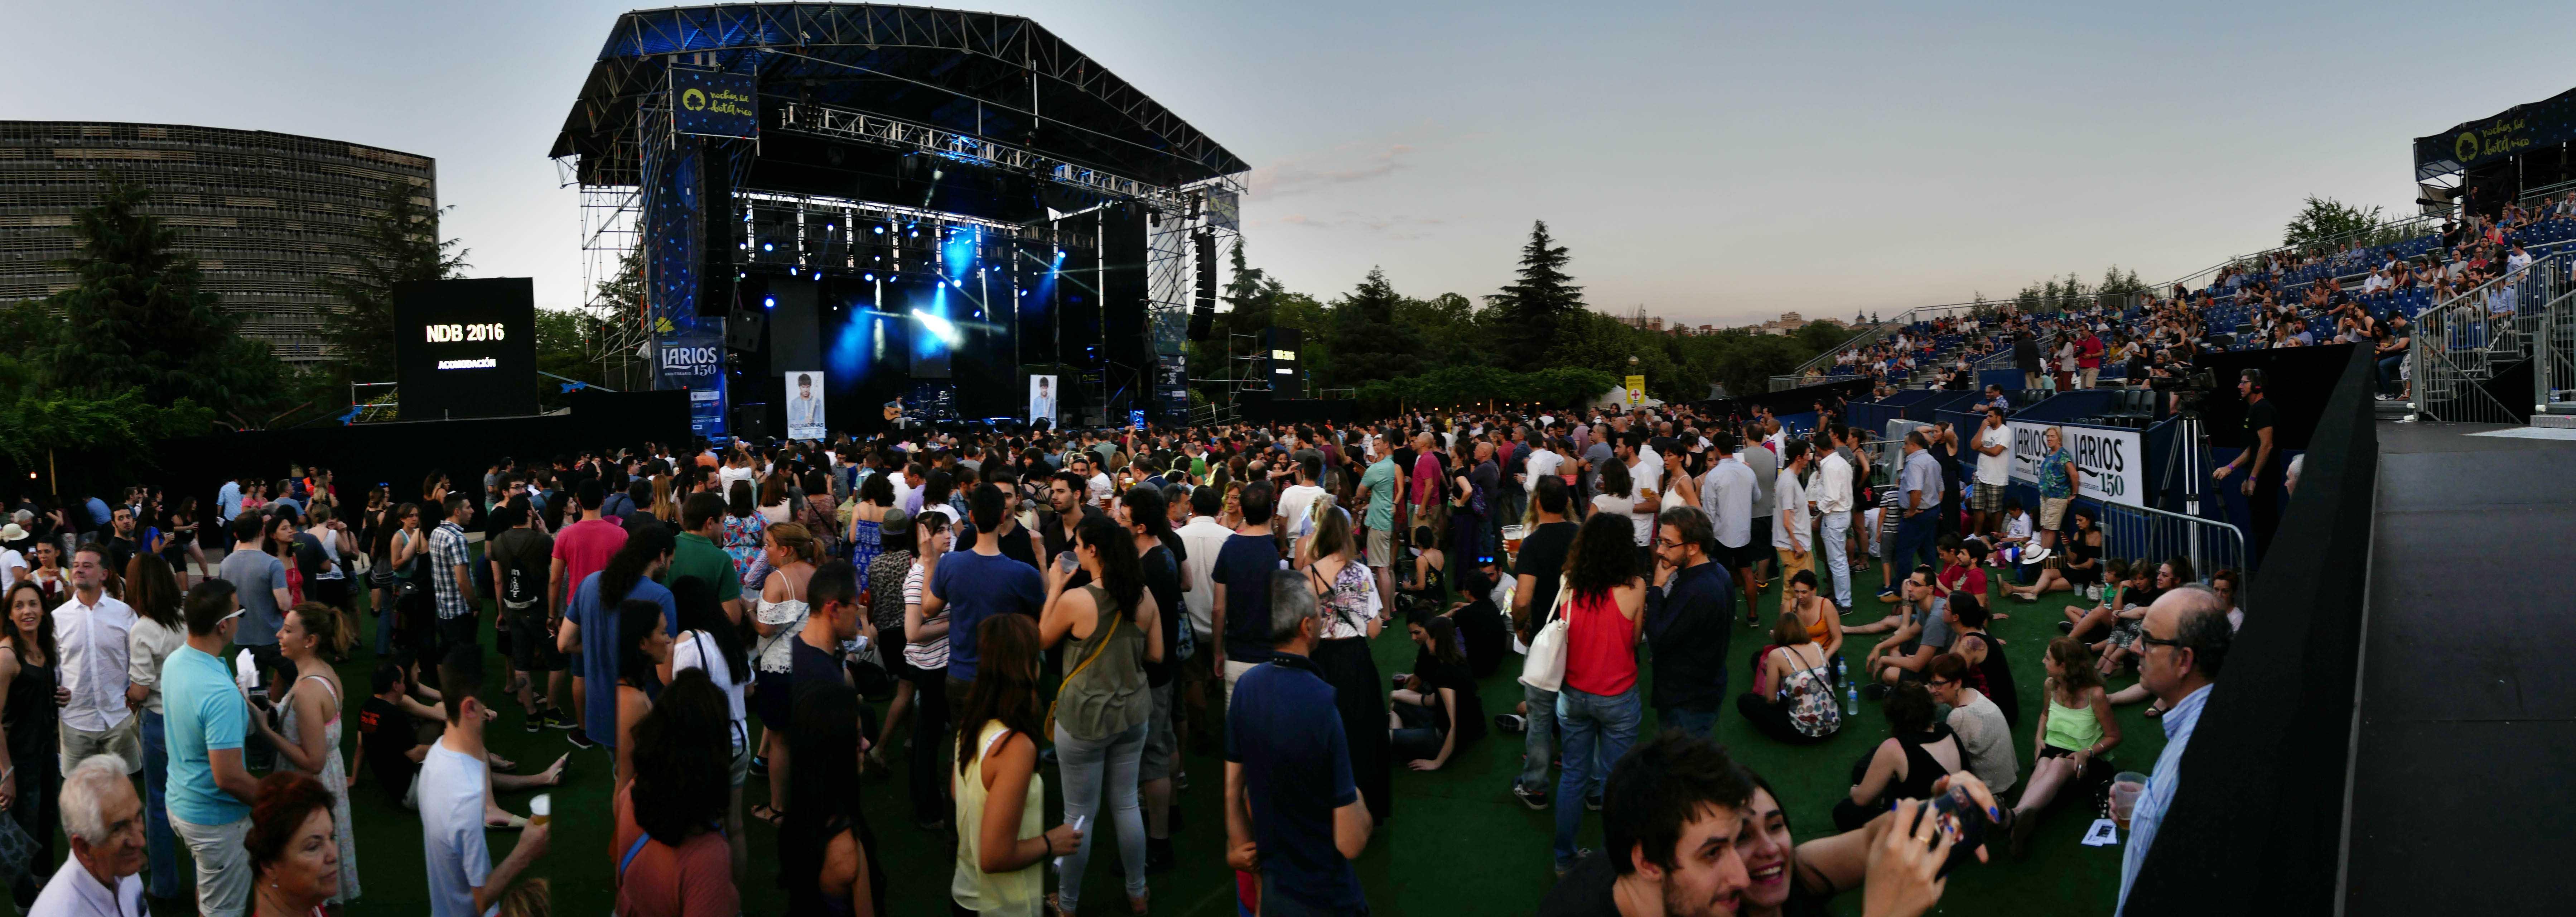 La leyenda viva del jazz tony bennett abrir la edici n for Conciertos jardin botanico 2017